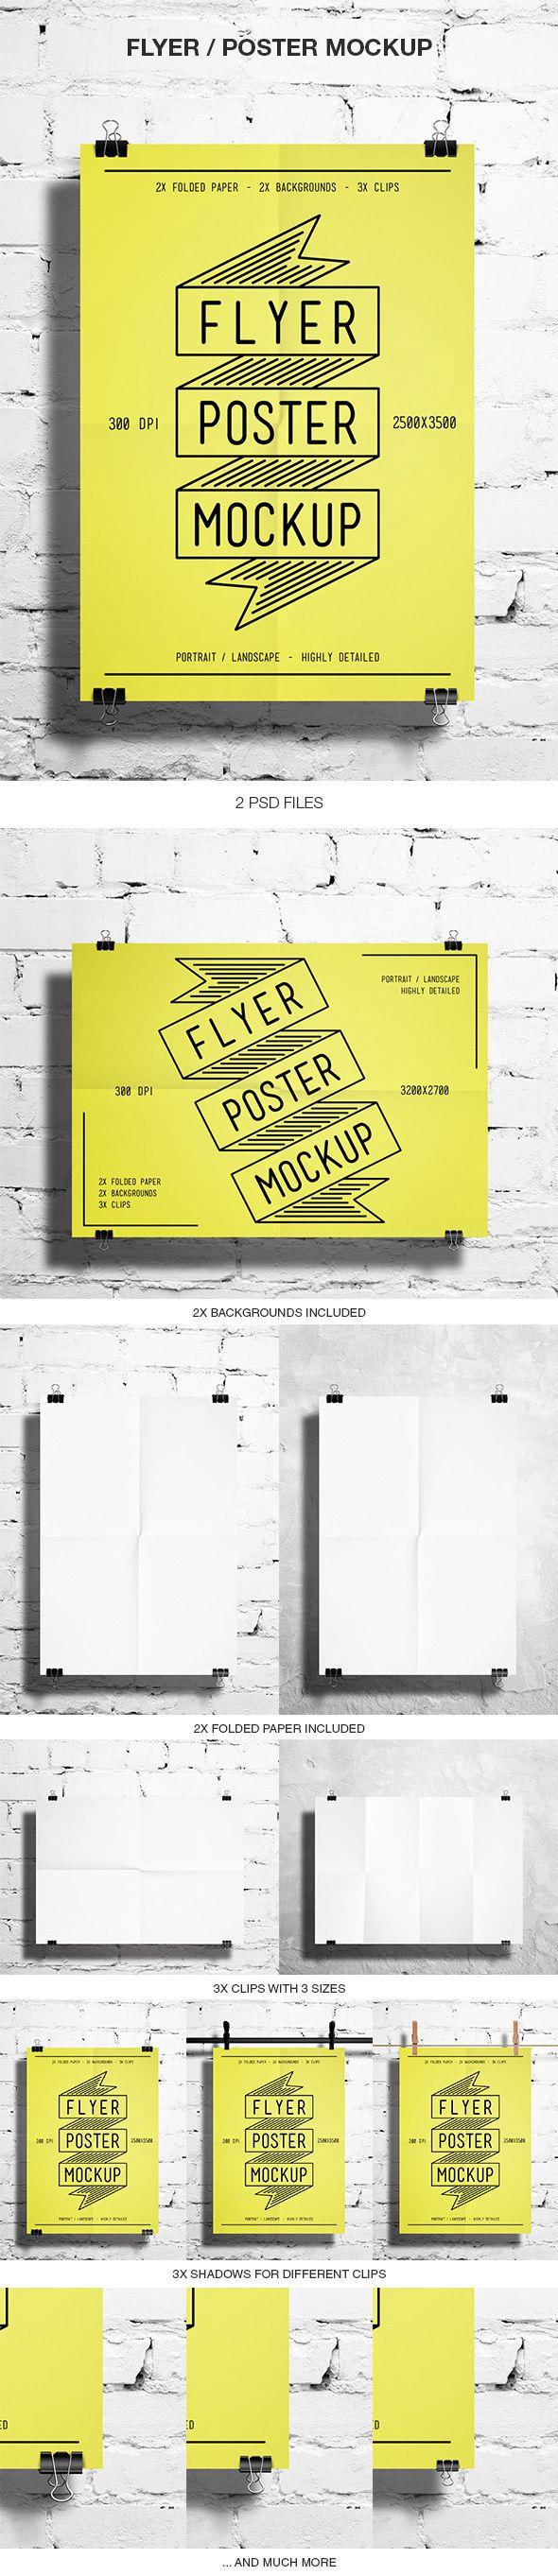 Flyer / Poster Maquette par BlueMonkeyLab, via Behance